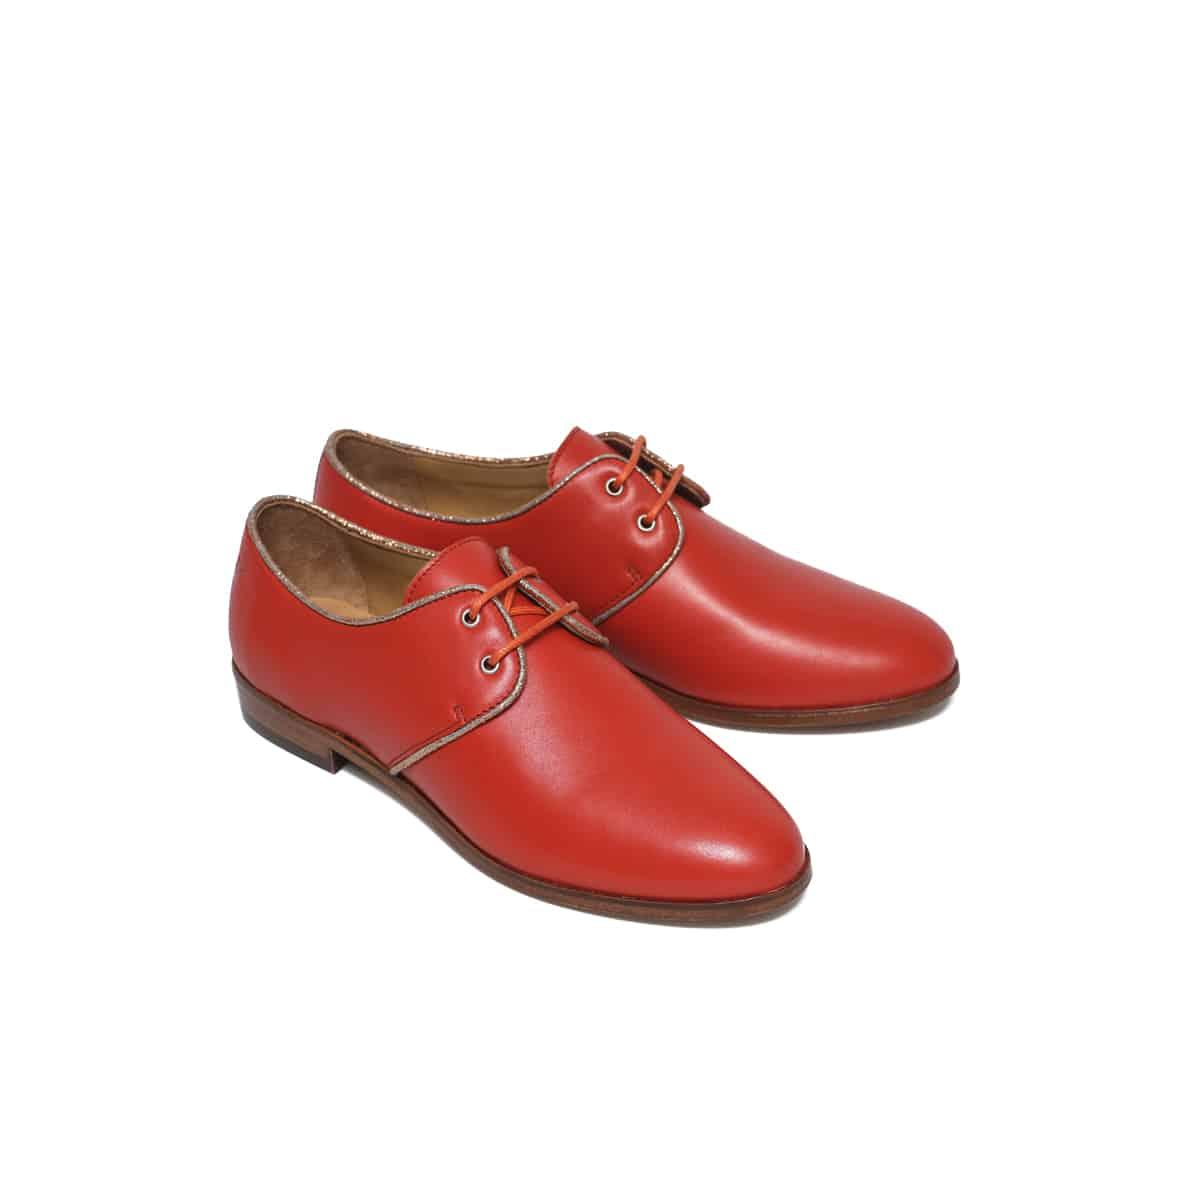 chaussures femme cuir pied de biche derbies